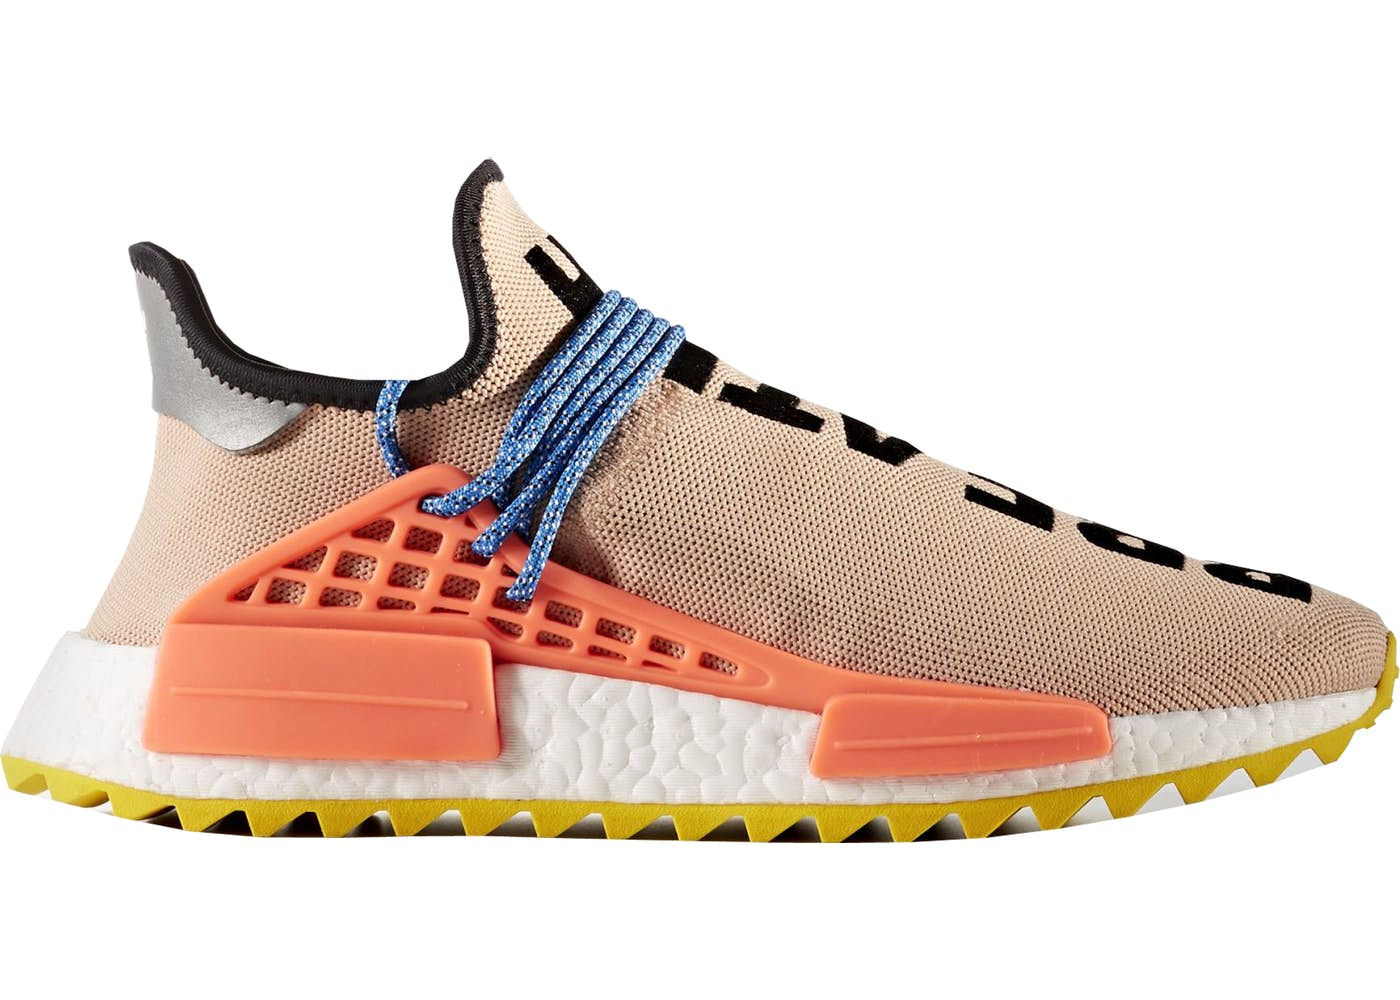 God Adidas PW Human Race NMD Trail x Pharrell Williams